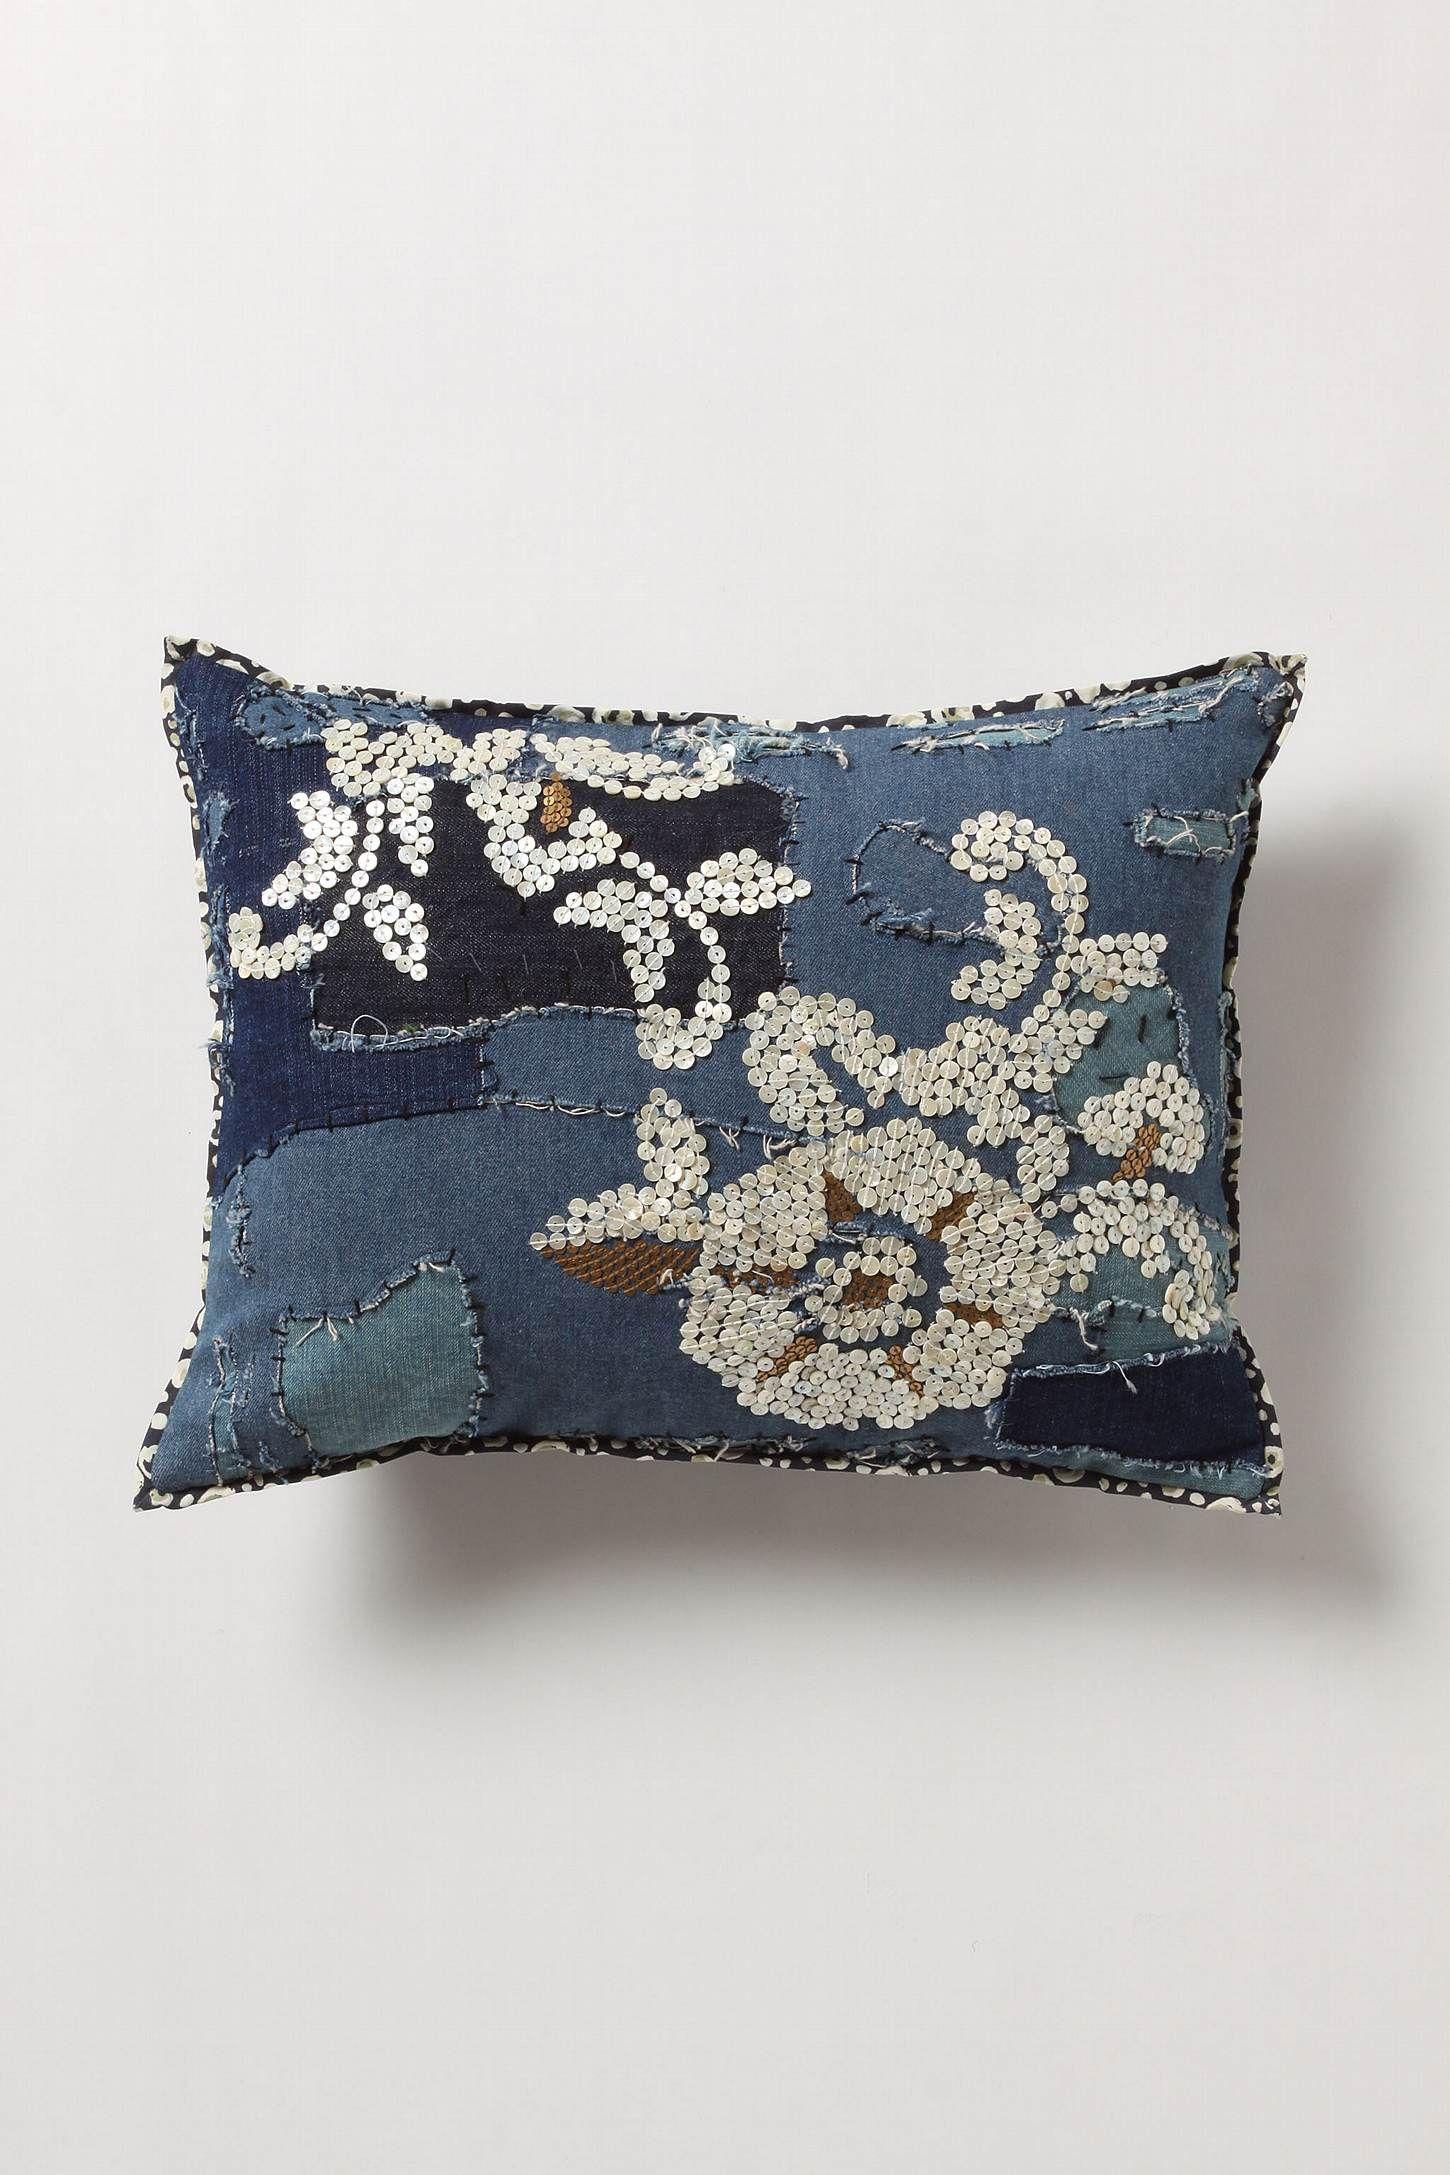 Pin by olga b on restyled denim pinterest pillows denim crafts